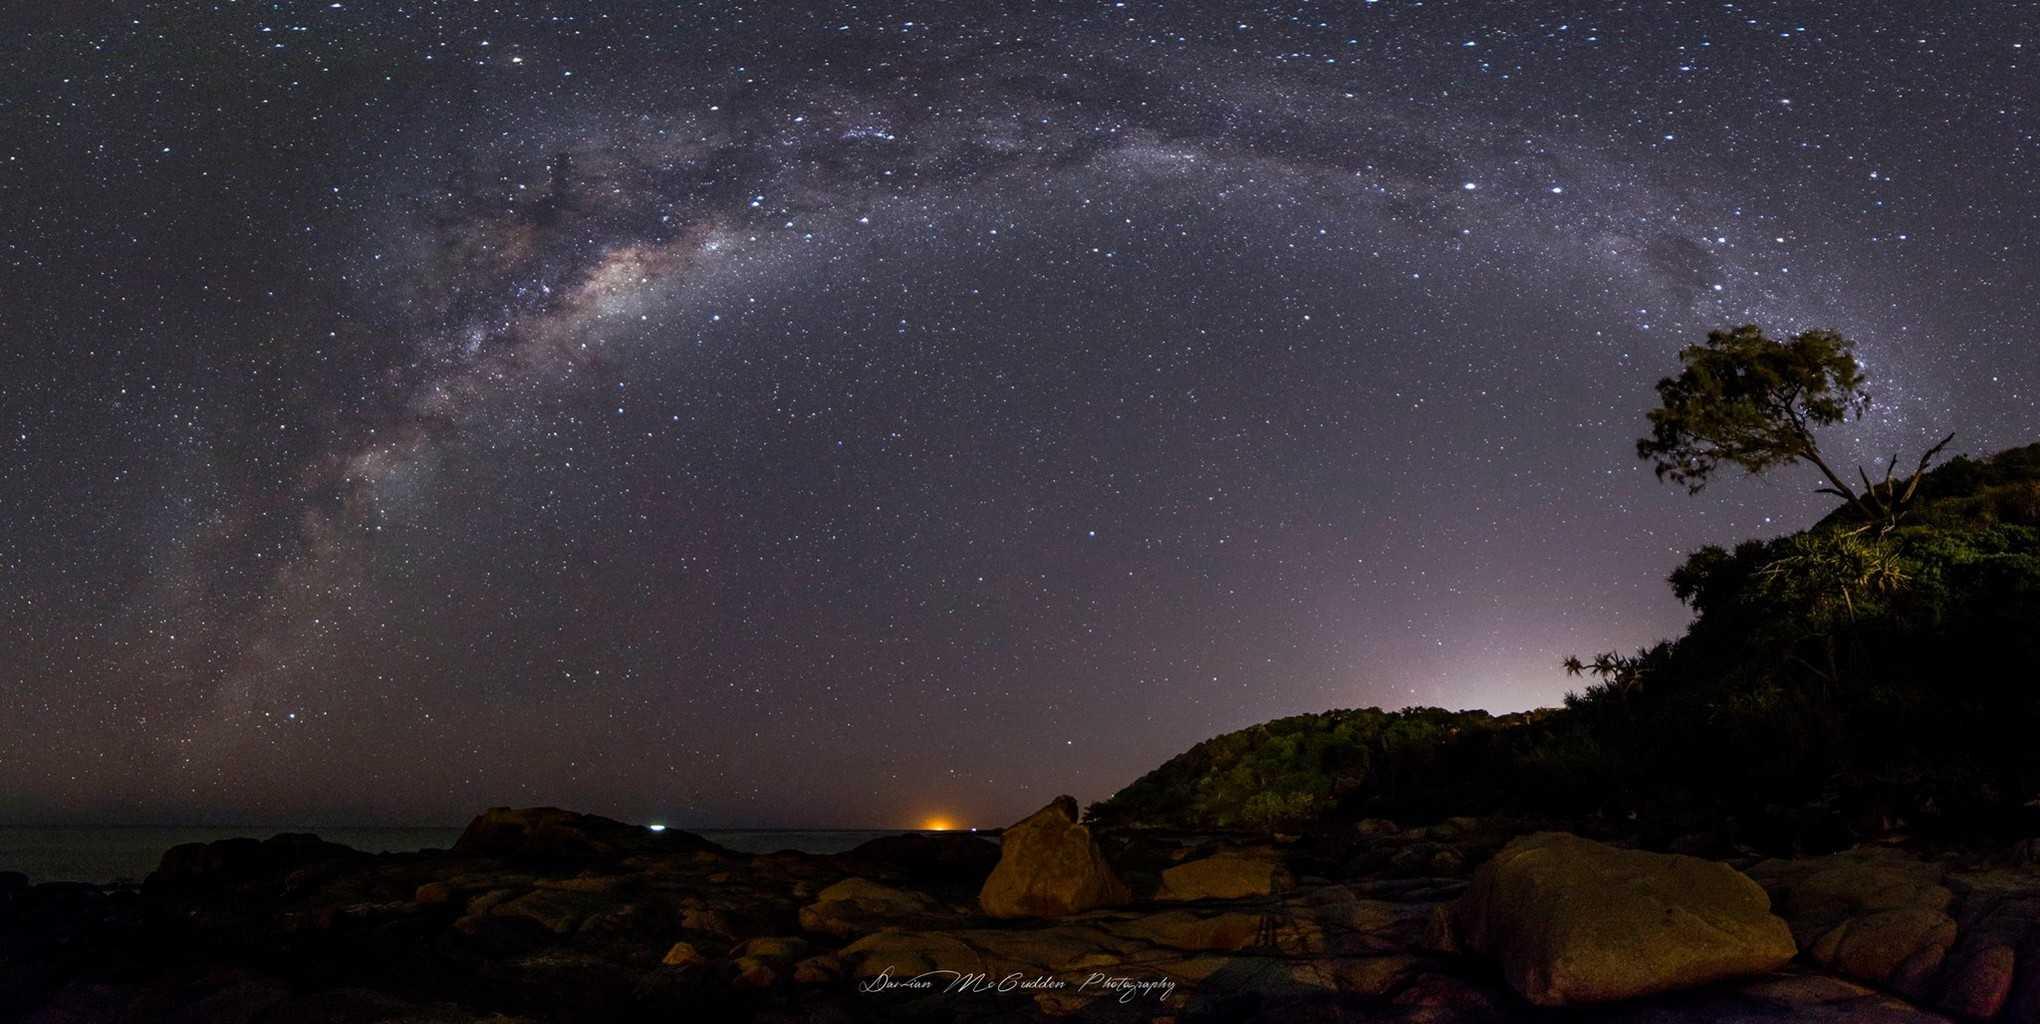 11 image Milky Way pano I took tonight at Coolum Beach, Australia.  Iso-4000 / 15seconds / f2,8 / 14mm /